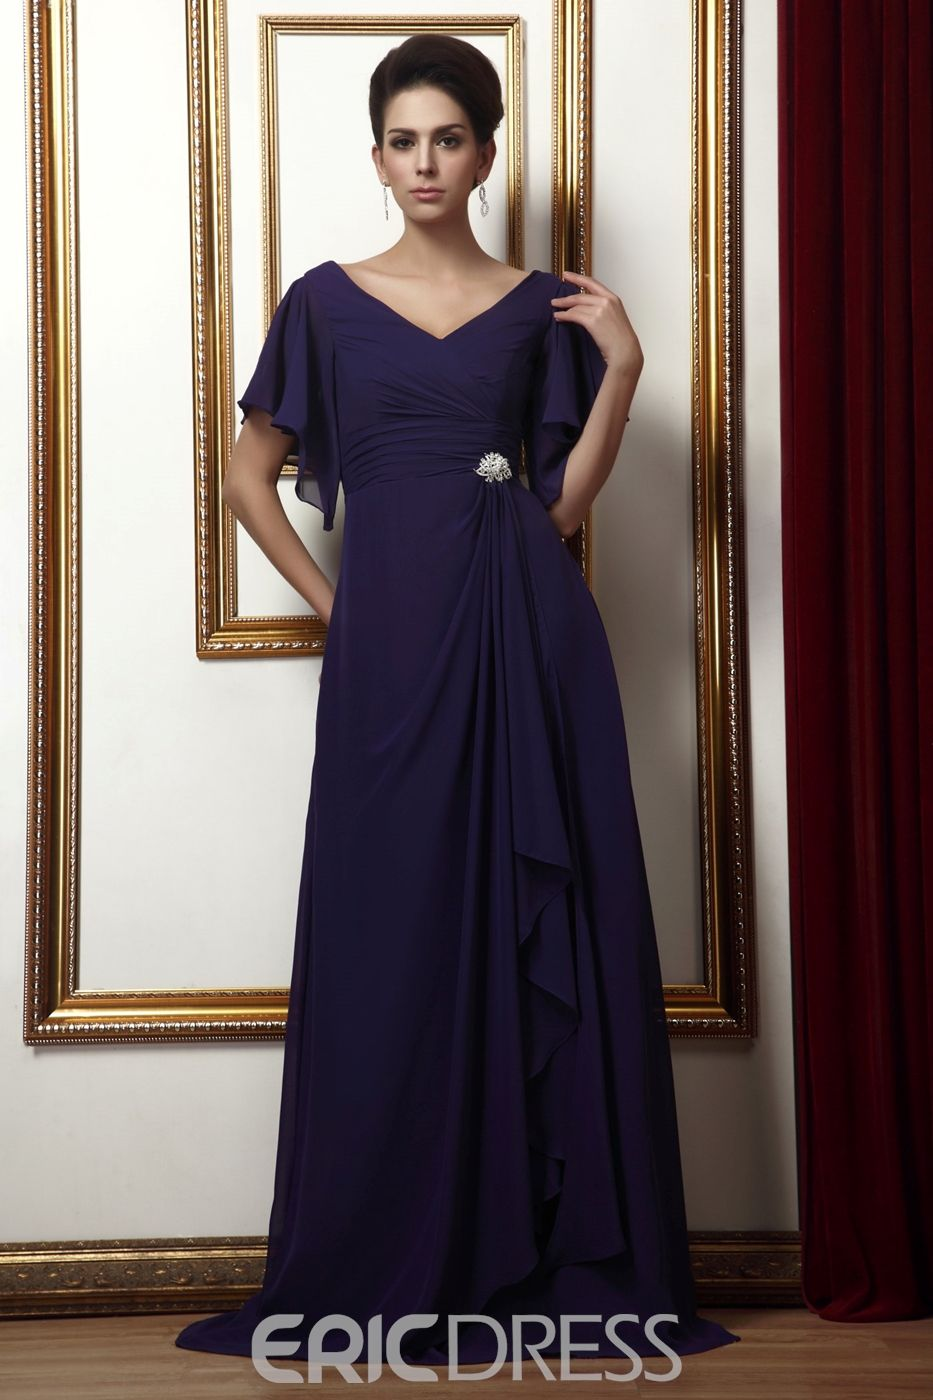 Fabulous long aline shortsleeves vneck mother of the bride dress